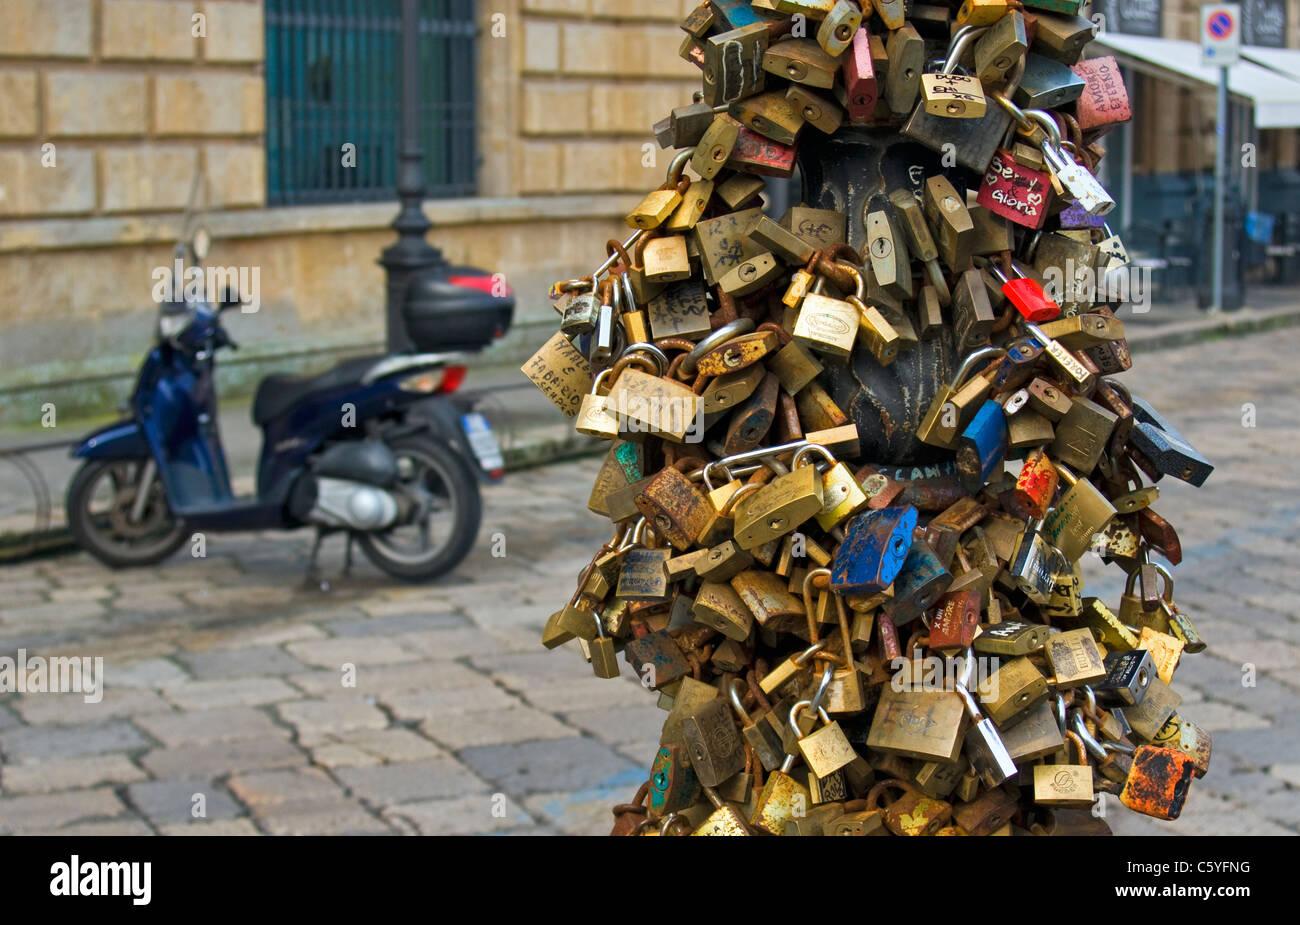 Love Locks (Padlocks) on Lamppost, Piazza Sant'Oronzo, Lecce, Apulia (Puglia), Southern Italy - Stock Image